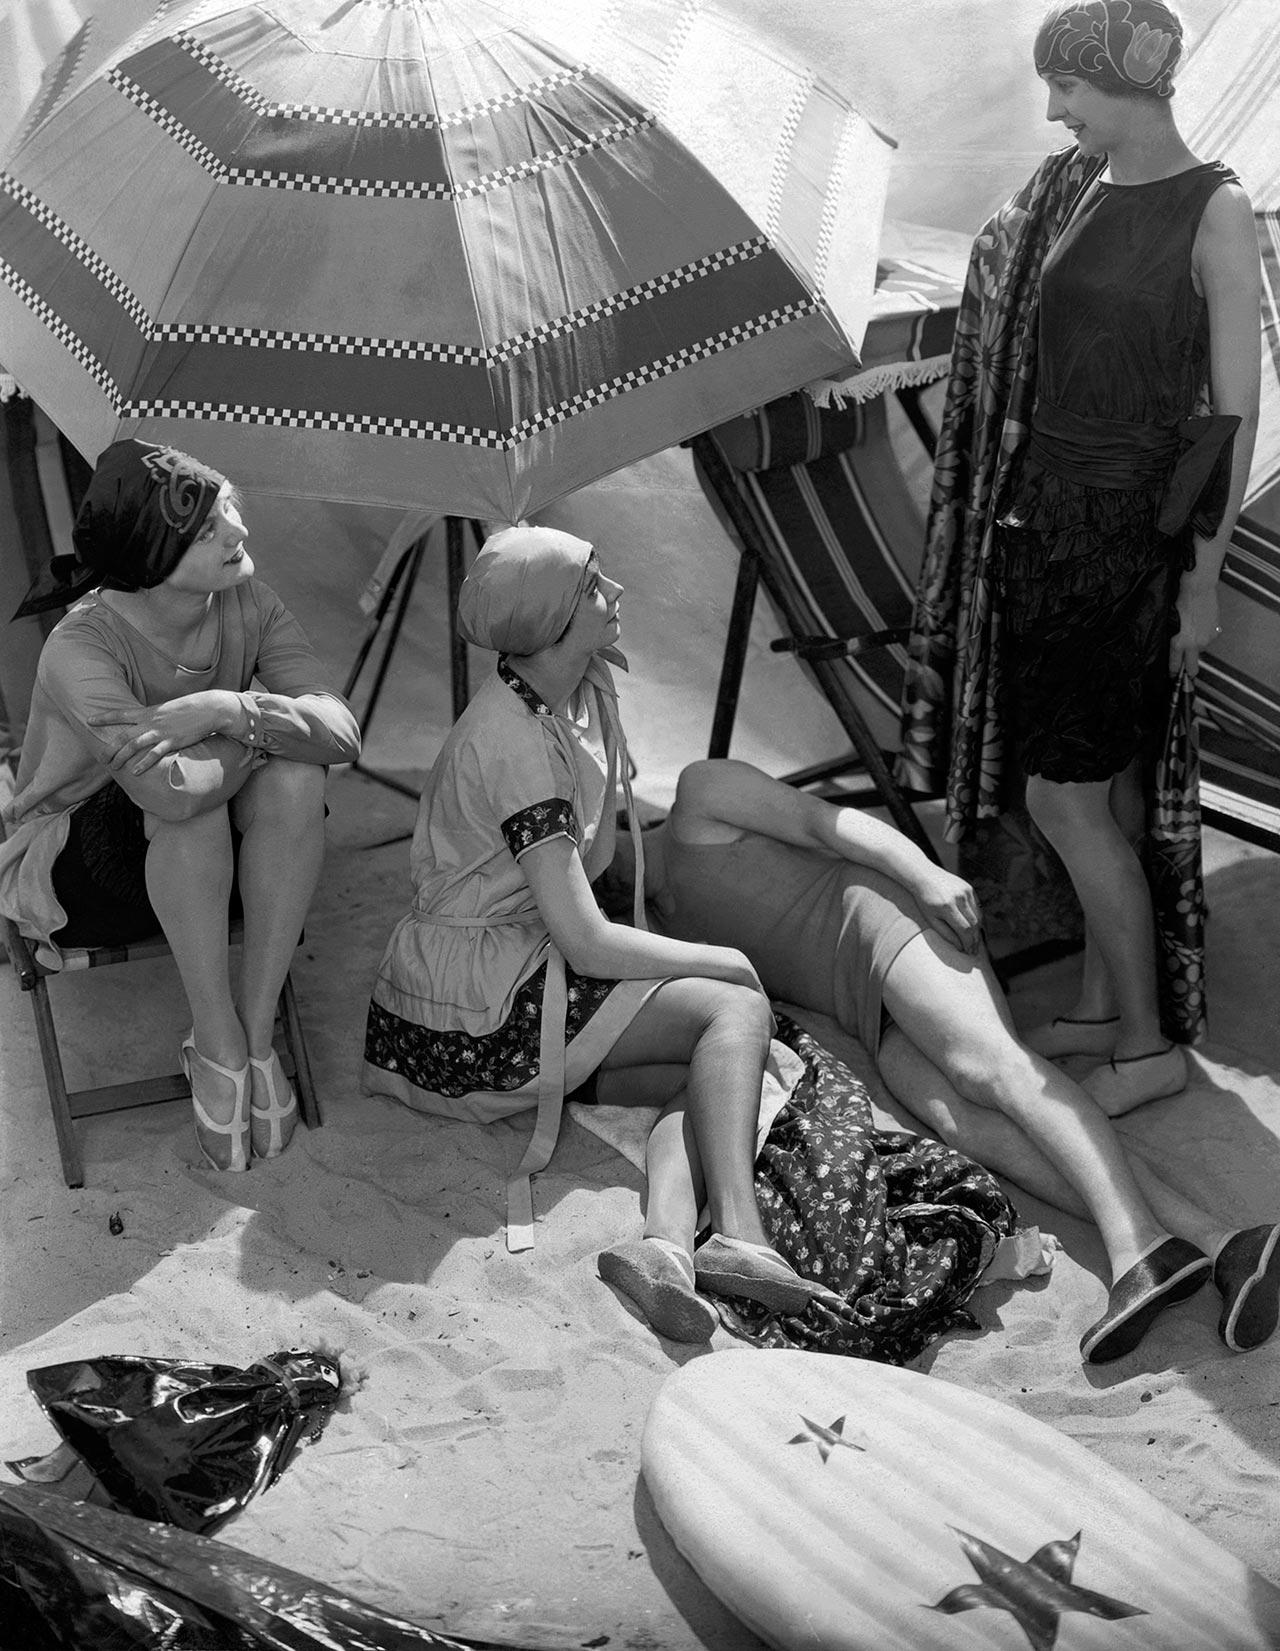 Beachwear circa 1925, photographed by Edward Steichen.